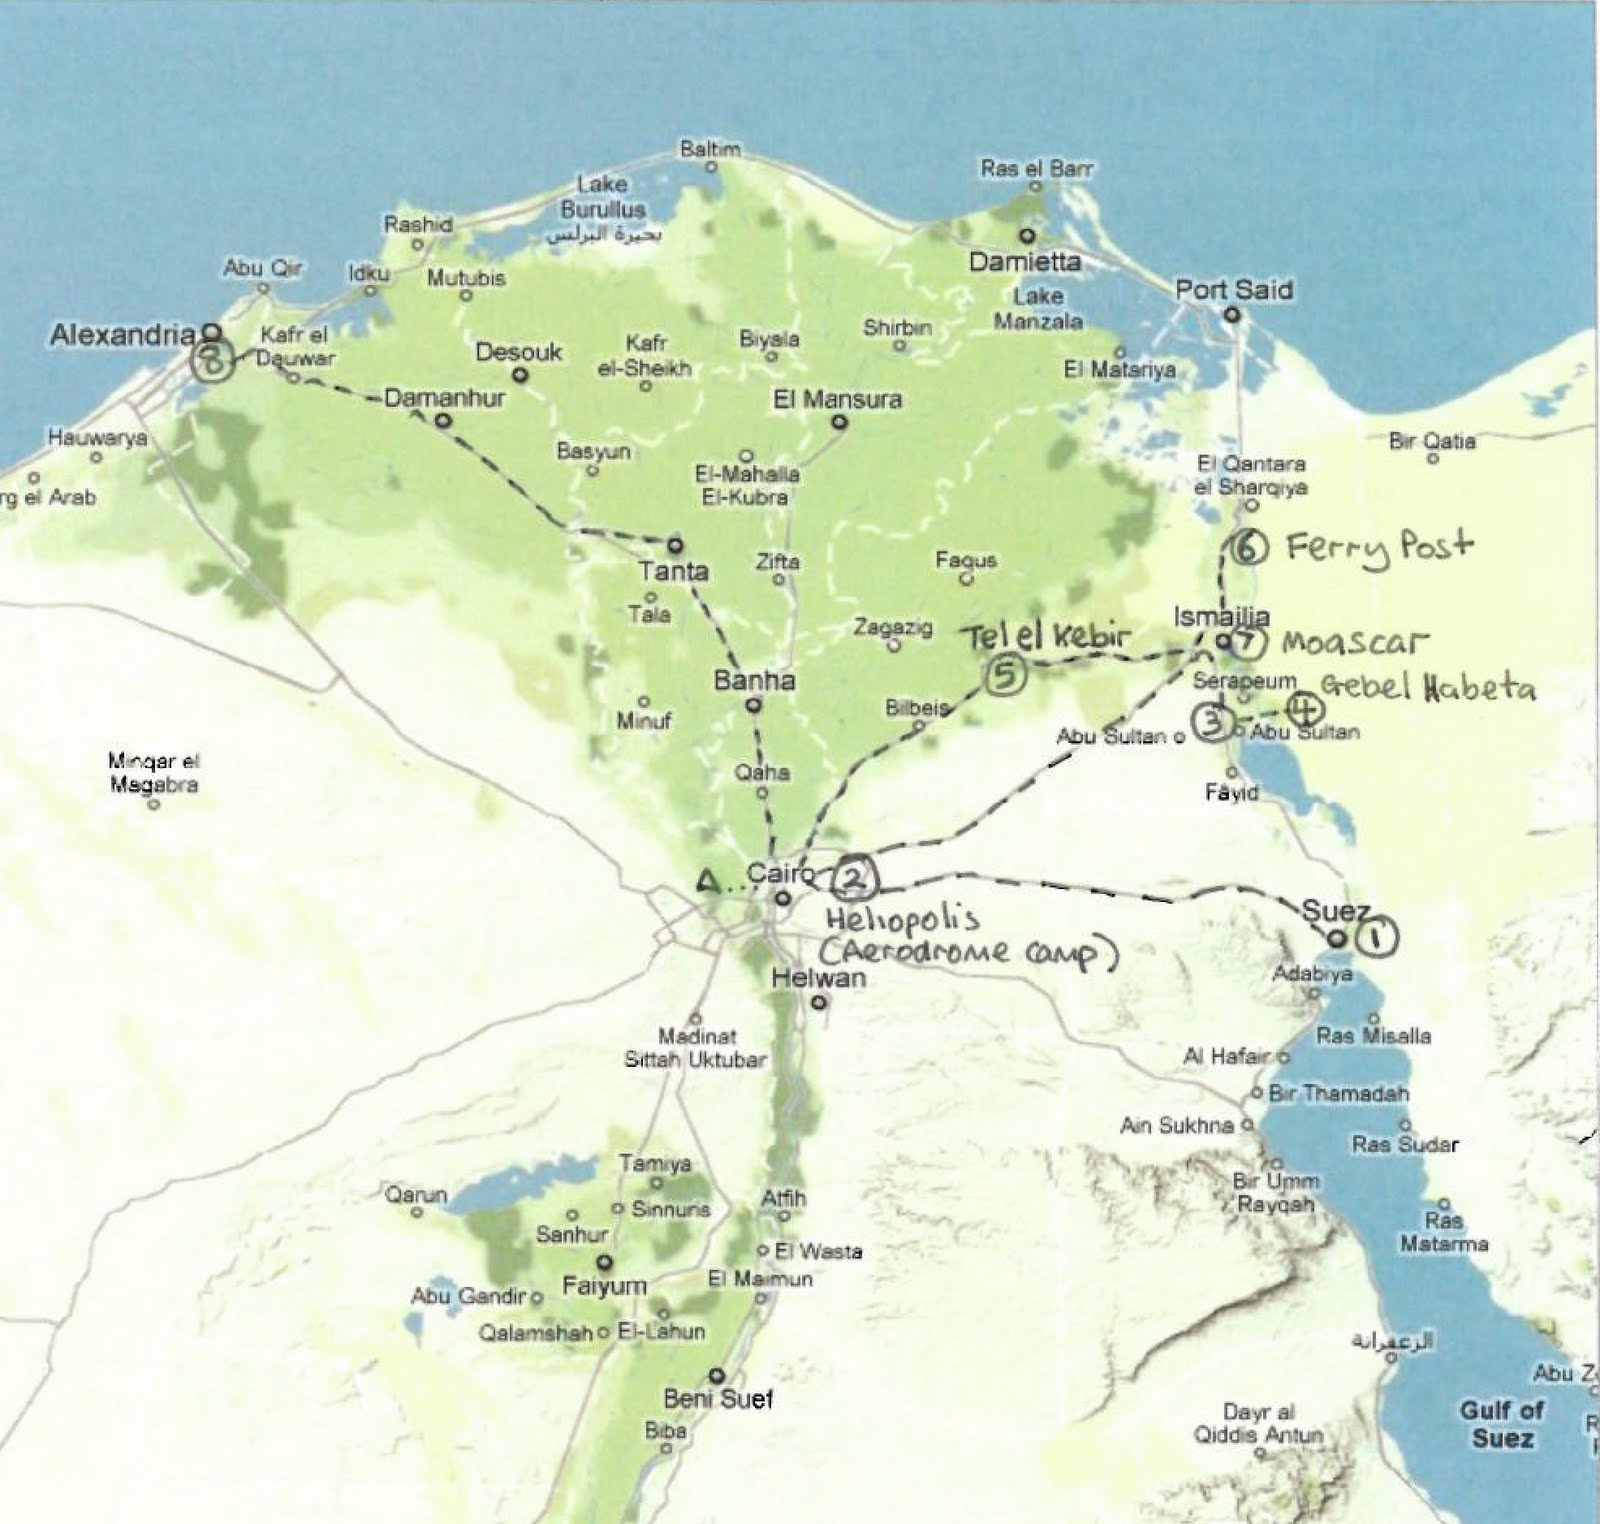 Thomas Michael Carrucan November - Map of egypt heliopolis